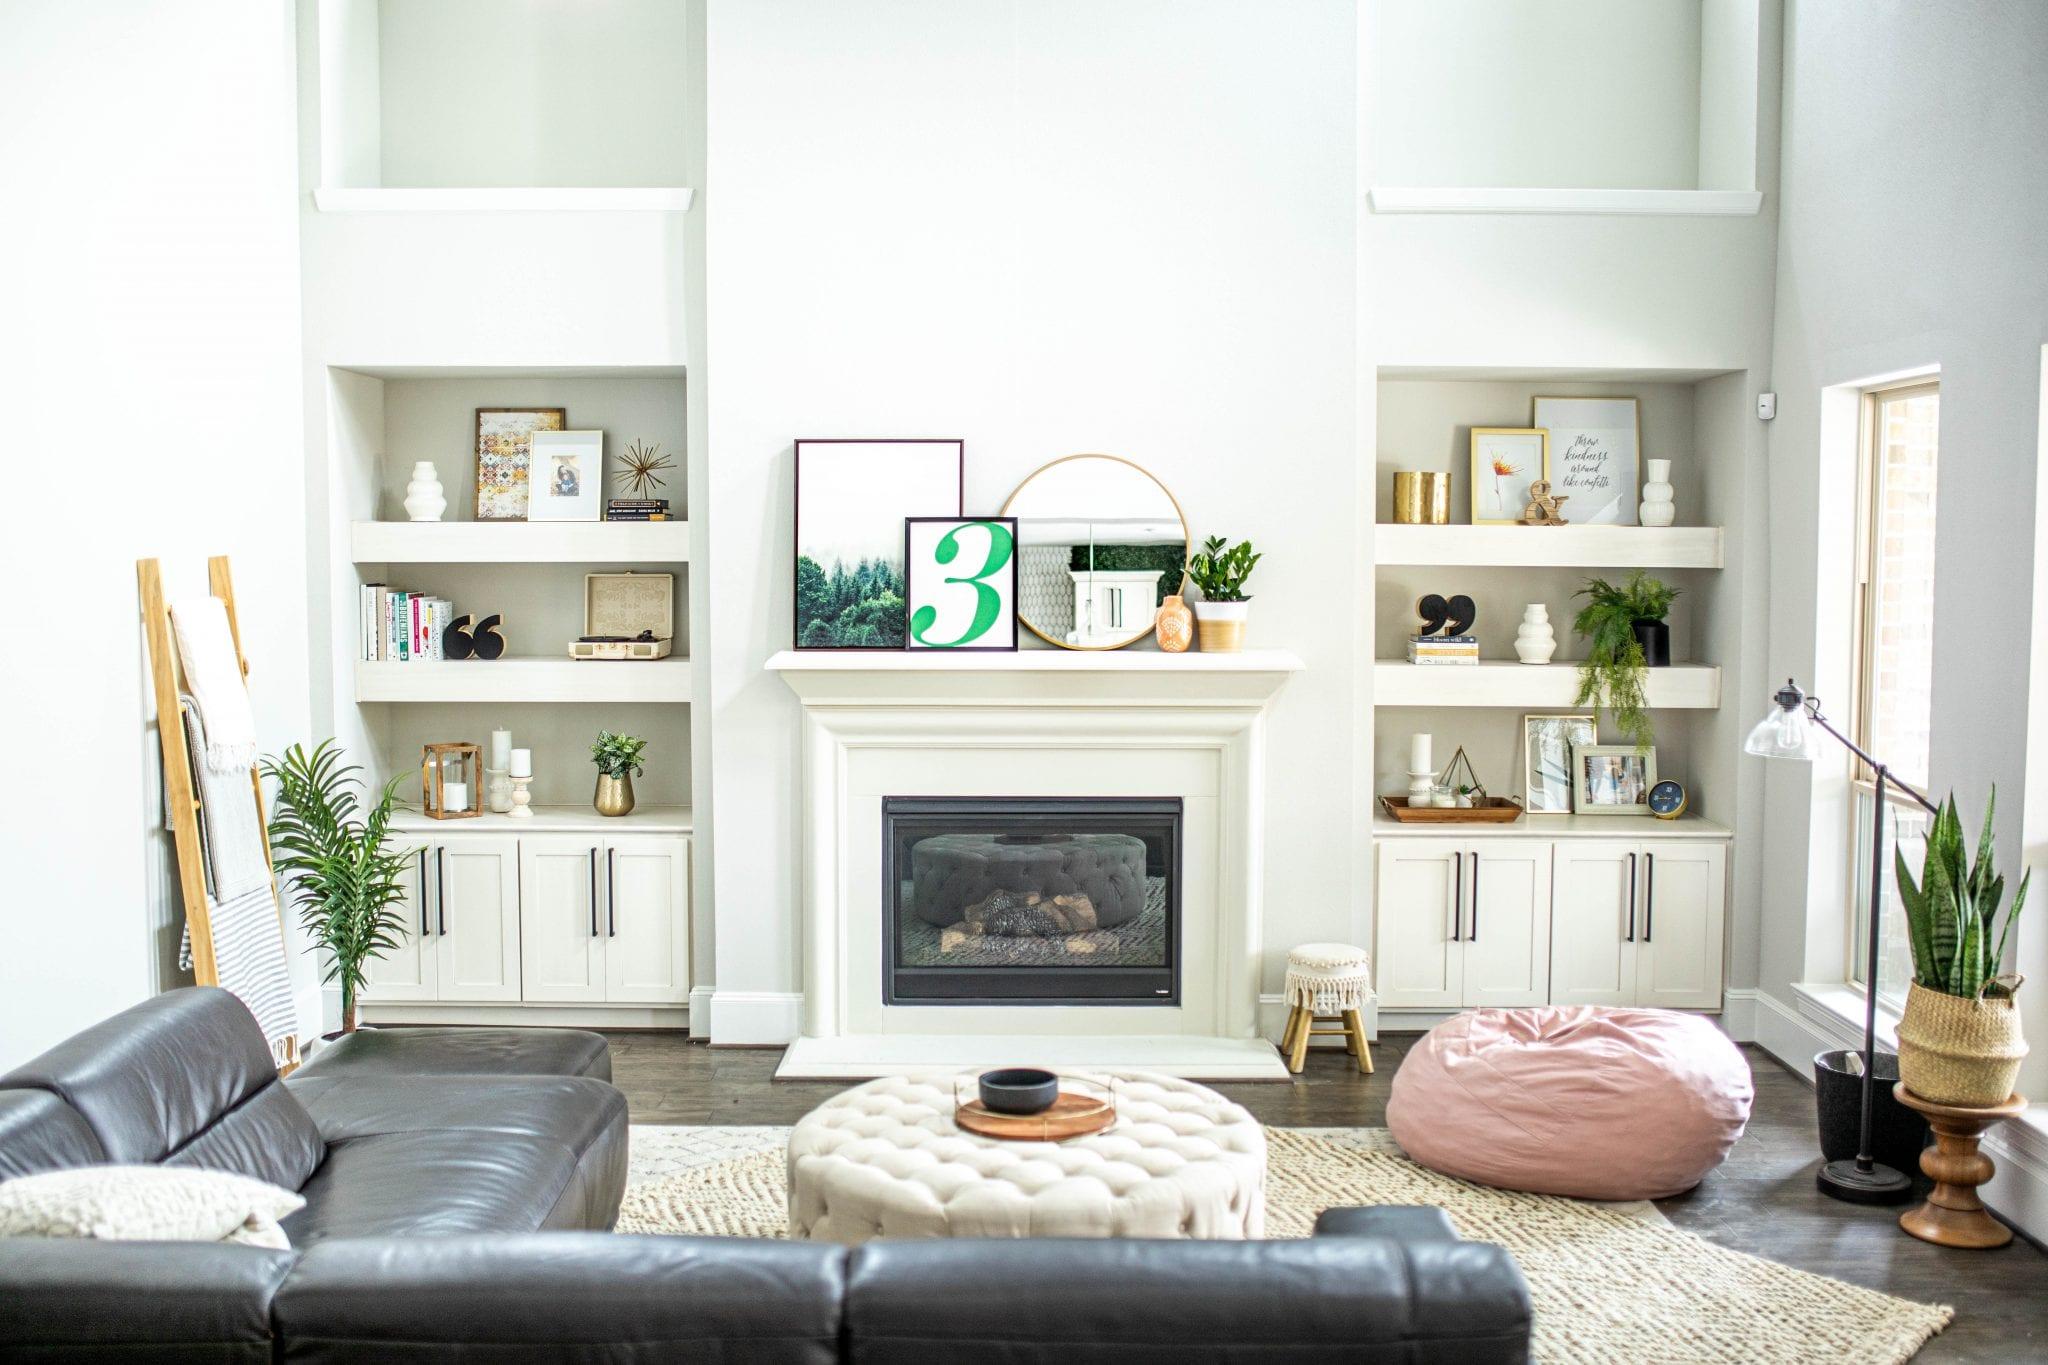 DIY Tray   Tile DIY Ideas   DIY Home Decor   home decor ideas   Diy projects   Never Skip Brunch by Cara Newhart   #home #diy #decor #neverskipbrunch